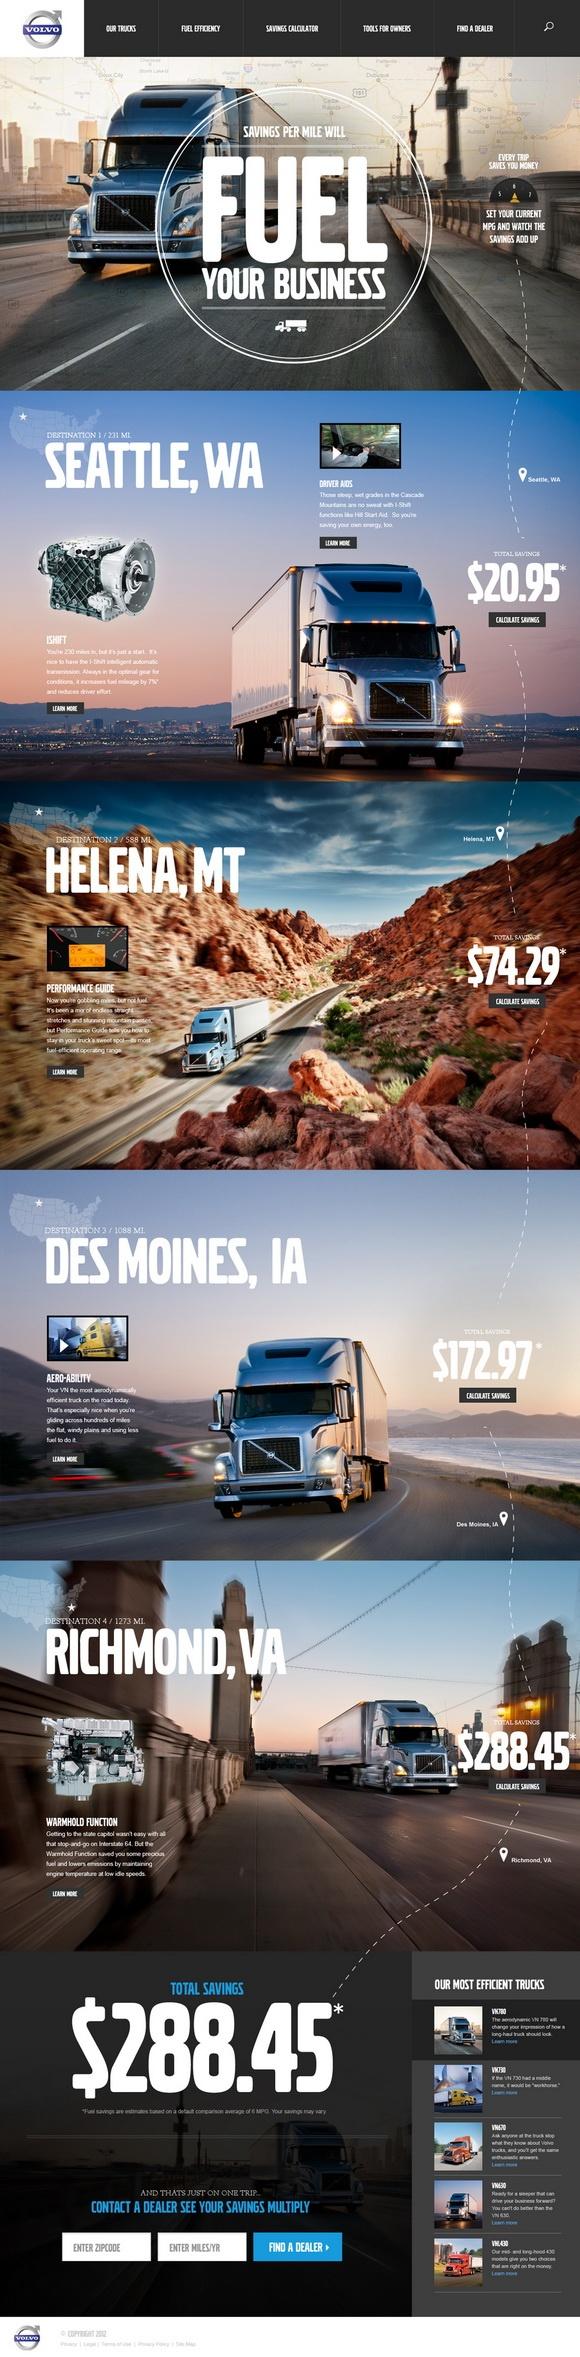 Cool Automotive Web Design on the Internet. Volvo. #automotive #webdesign @ http://www.pinterest.com/alfredchong/automotive-web-design/